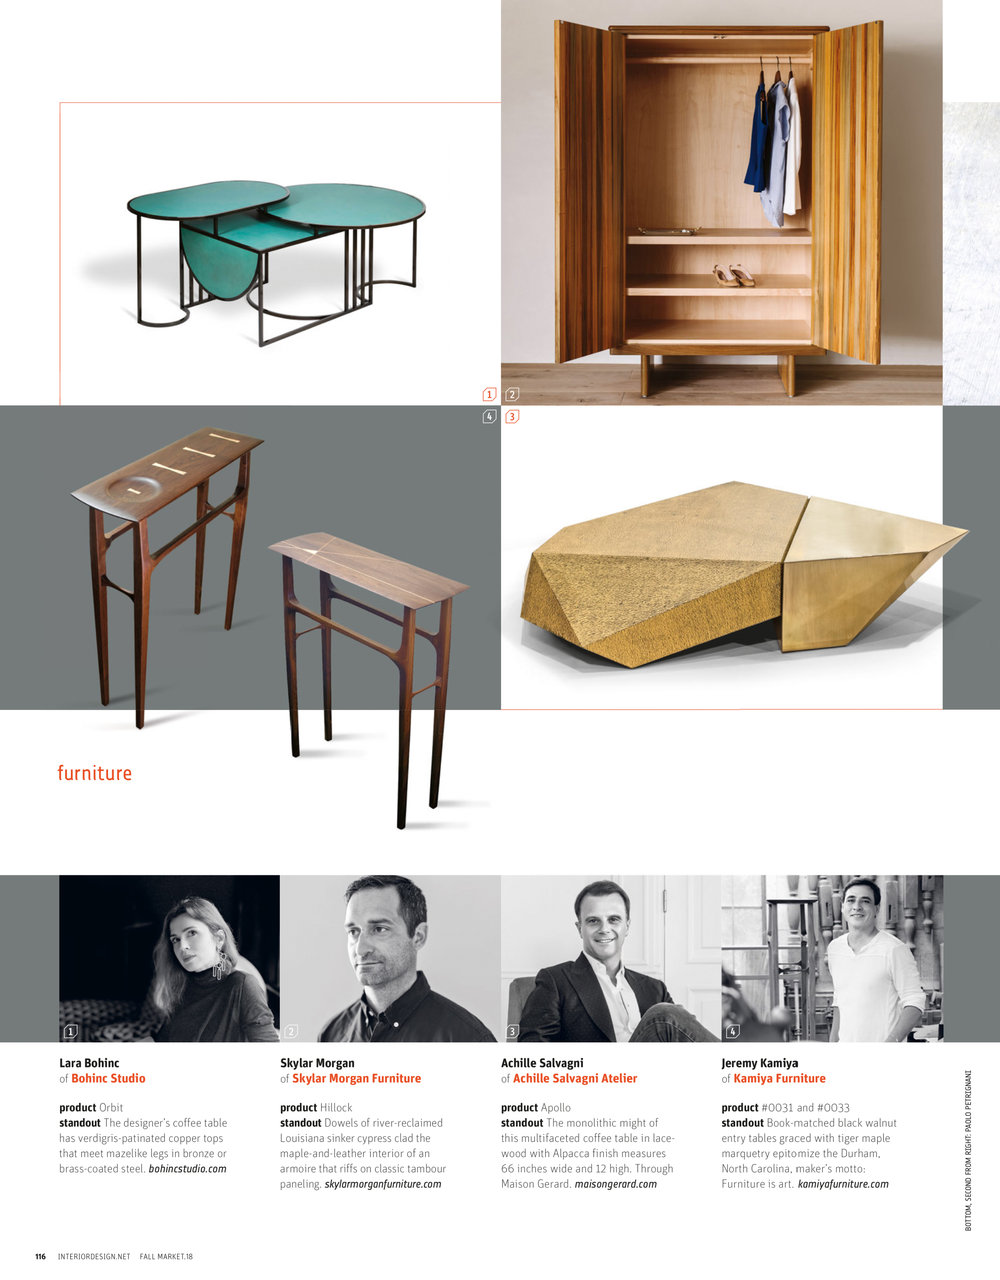 Kamiya Furniture Interior Design